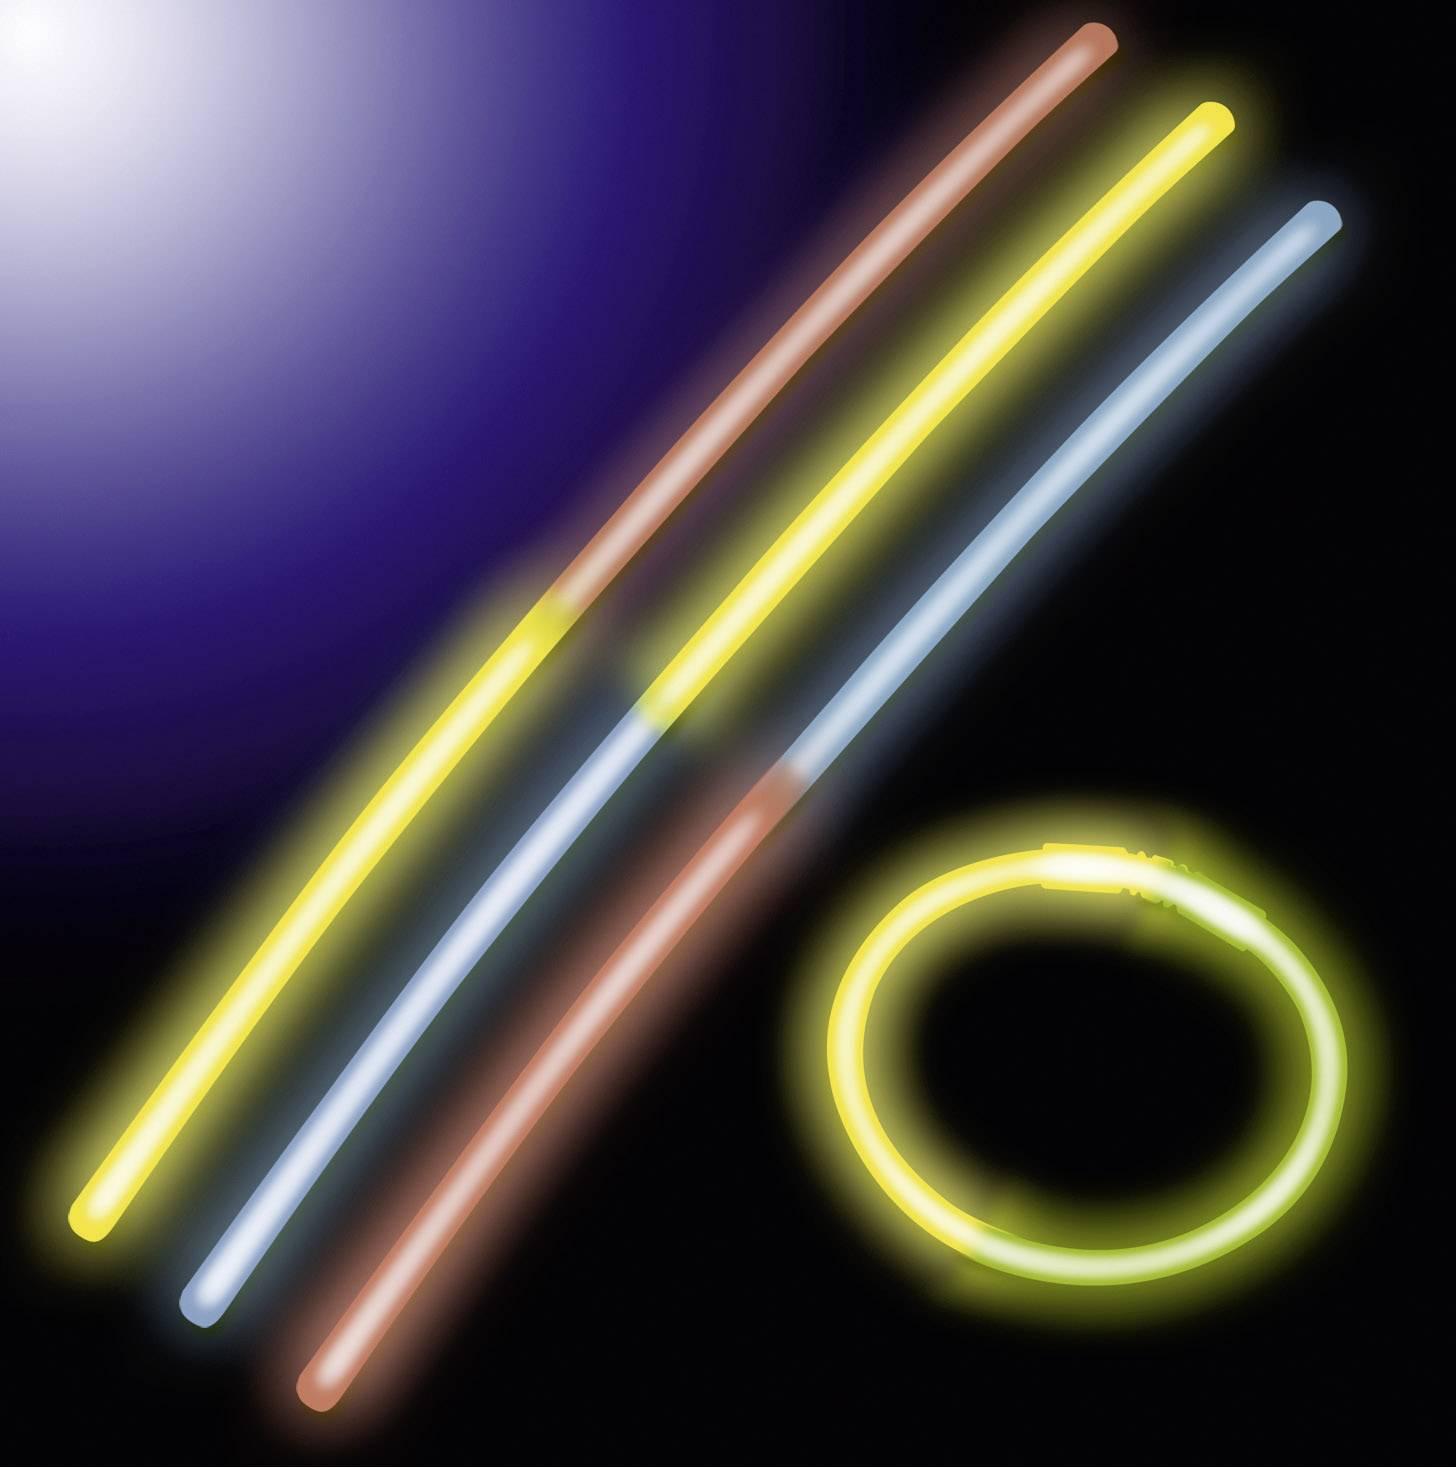 Neon-Knick C-10.205x5-2cmx, 20 cm, 10-dielna, farebná